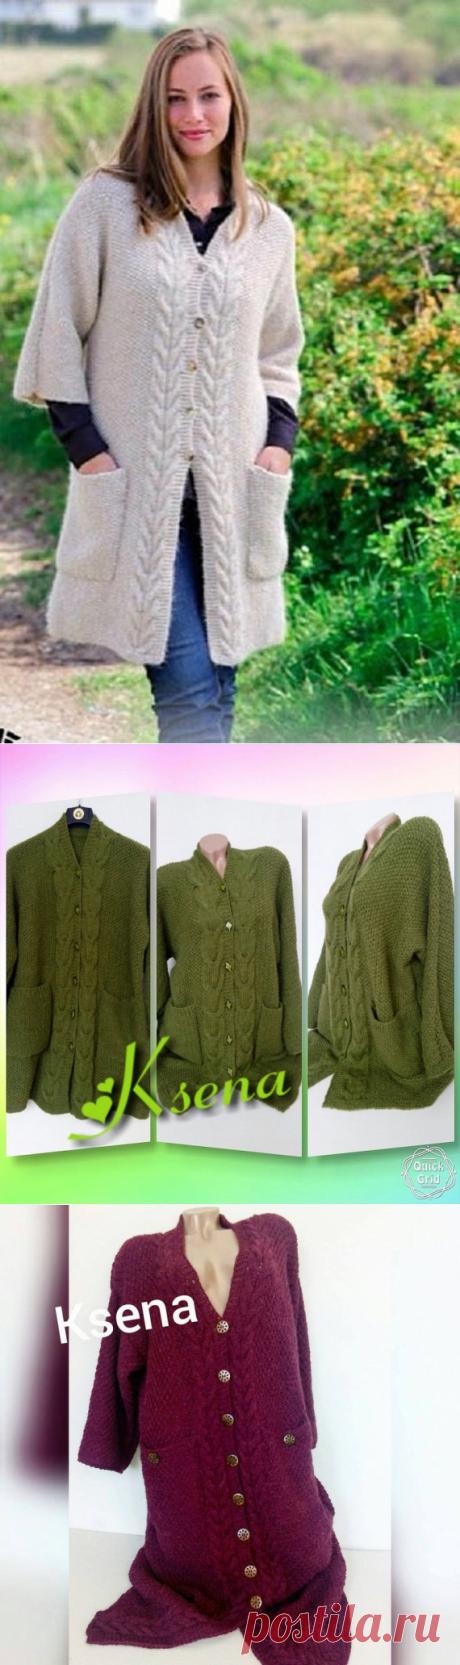 Knit cardigan women Chunky knit cardigan Oversized knit | Etsy